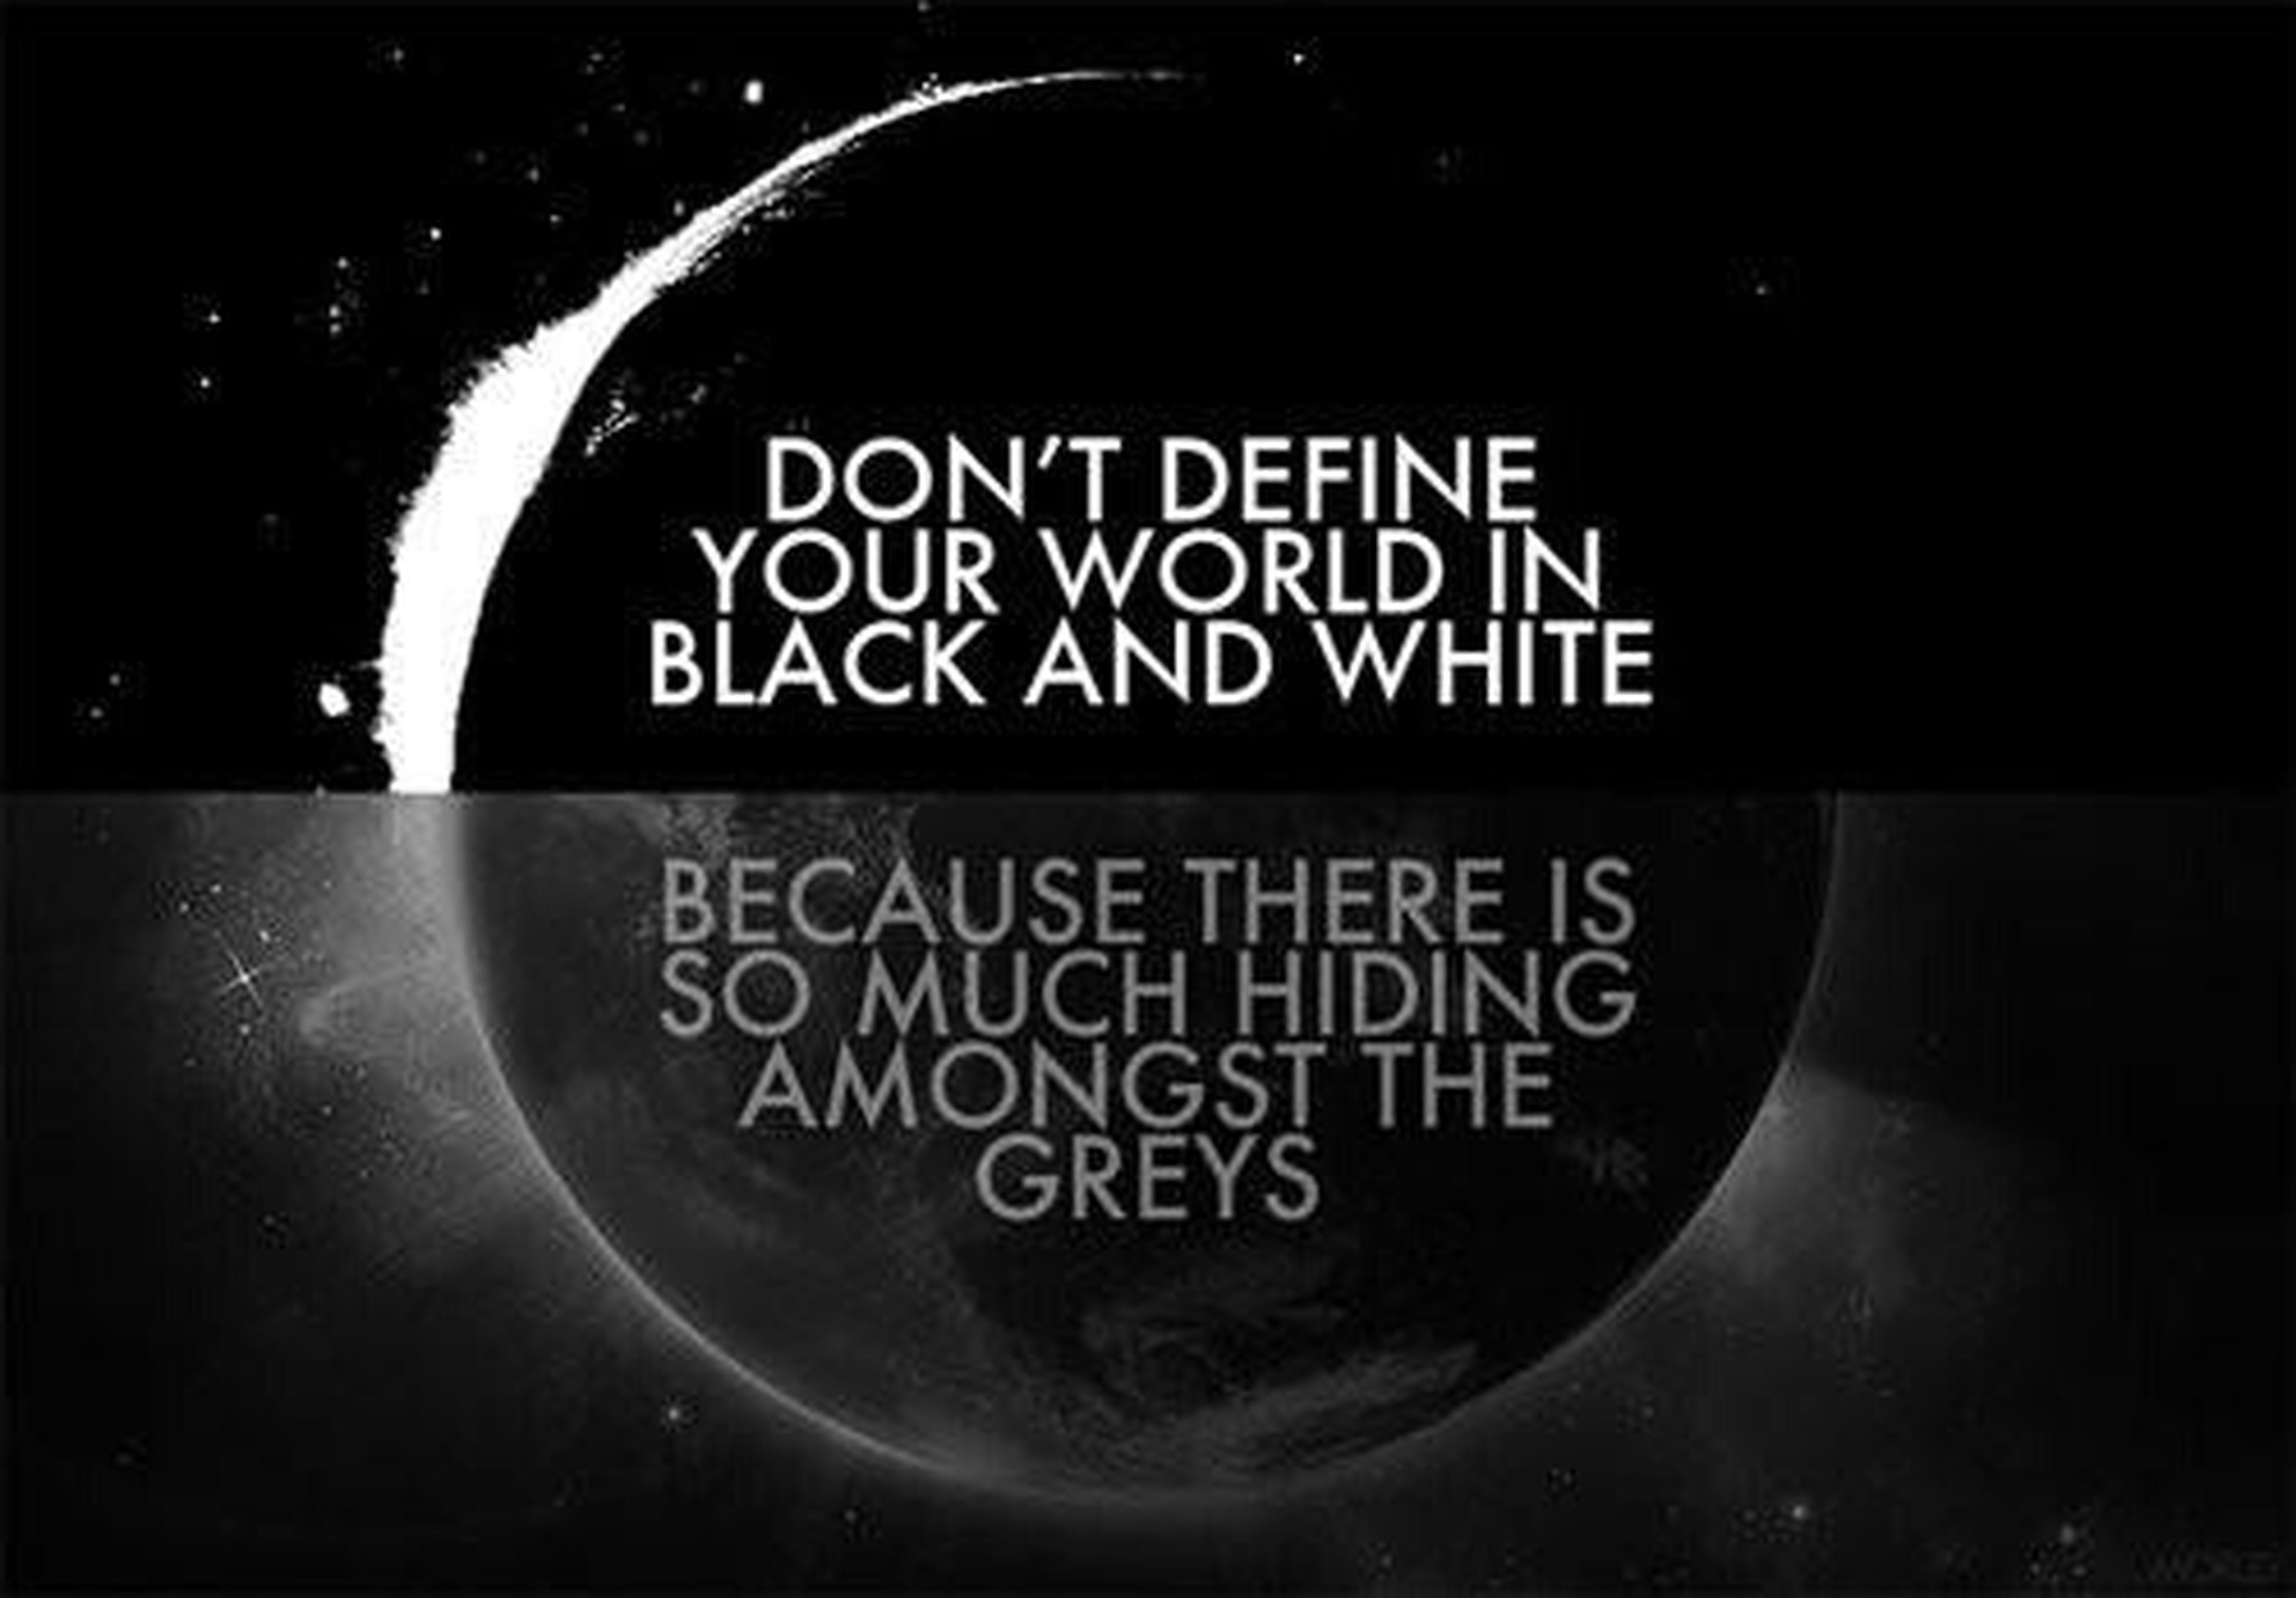 Lifechangesfast Itslifeafteerall Liveit Fightallodds Greys Blackandwhite